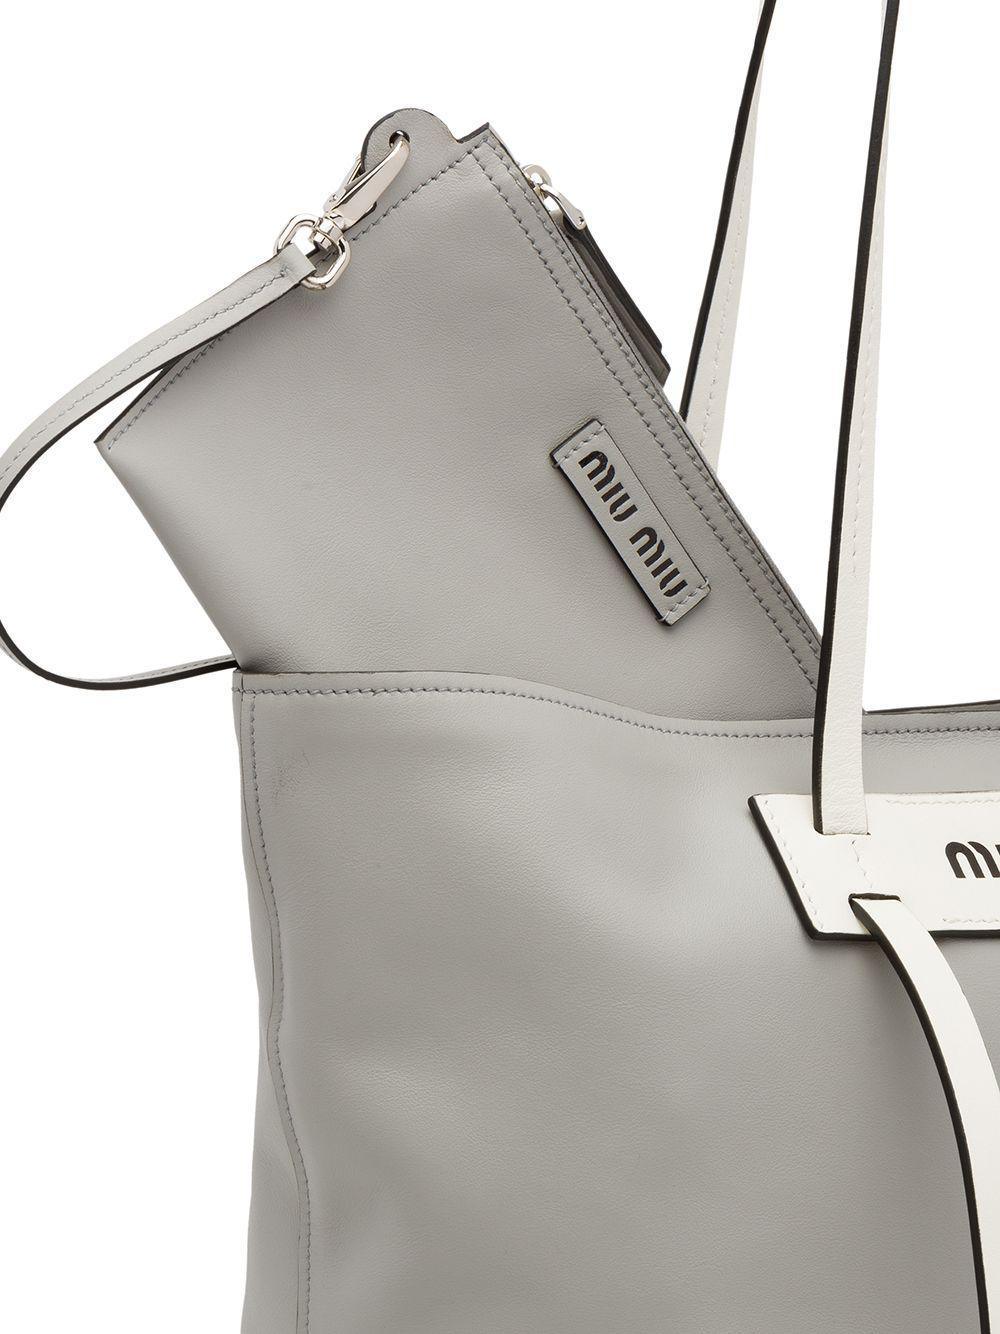 Miu Miu Leather Grace Lux Tote Bag in Grey (Grey)